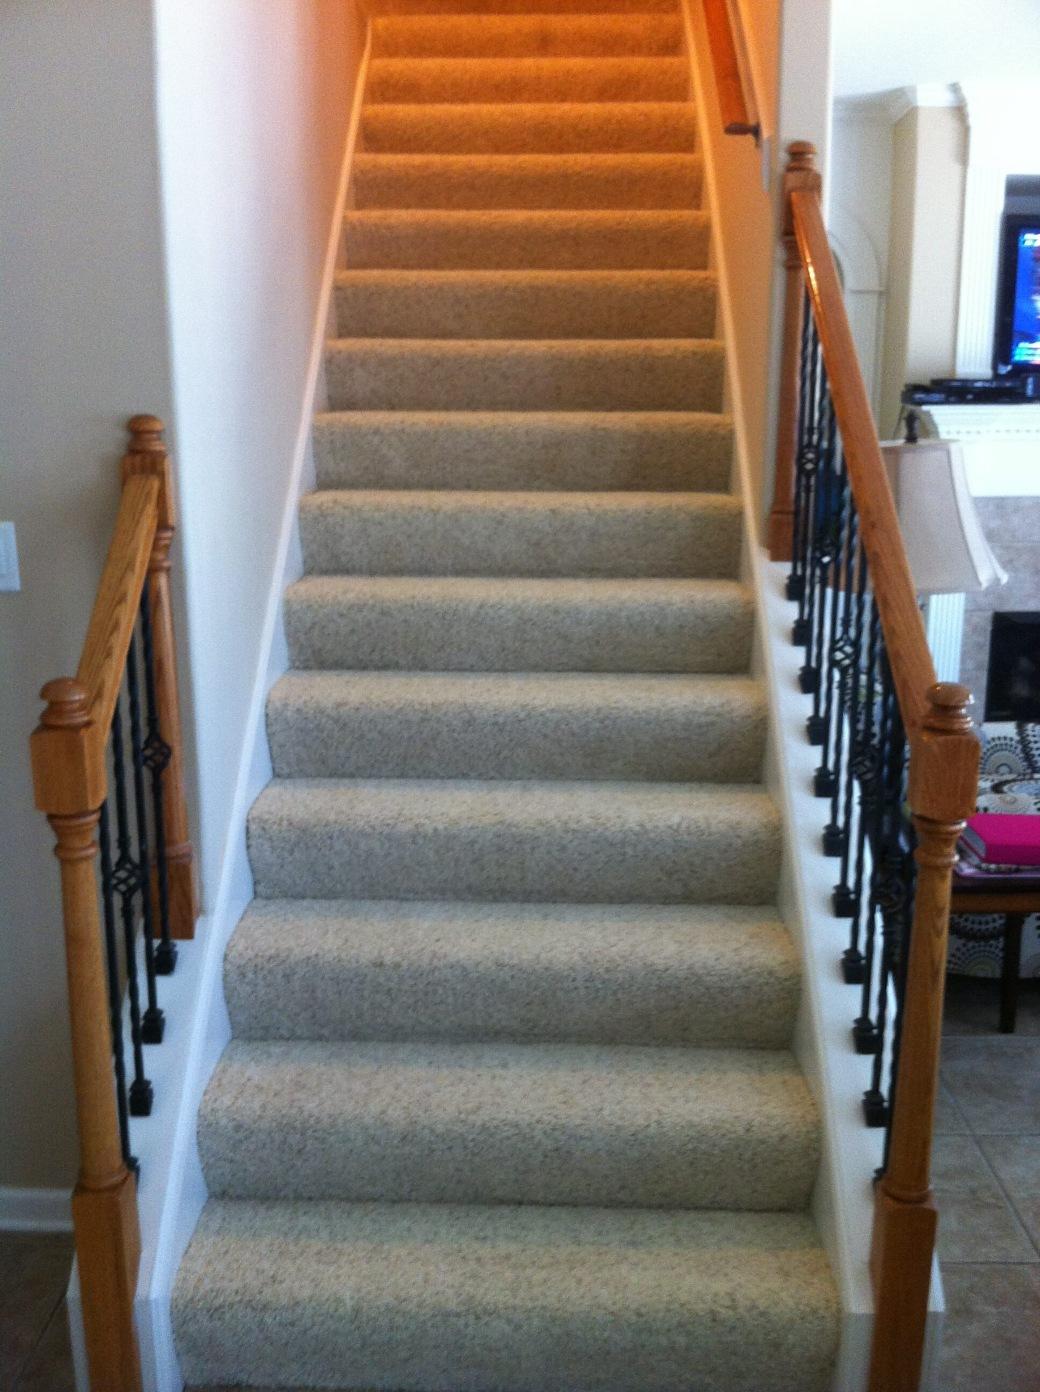 Lem kayu dan lem hpl Crona - keamanan karpet lantai tangga